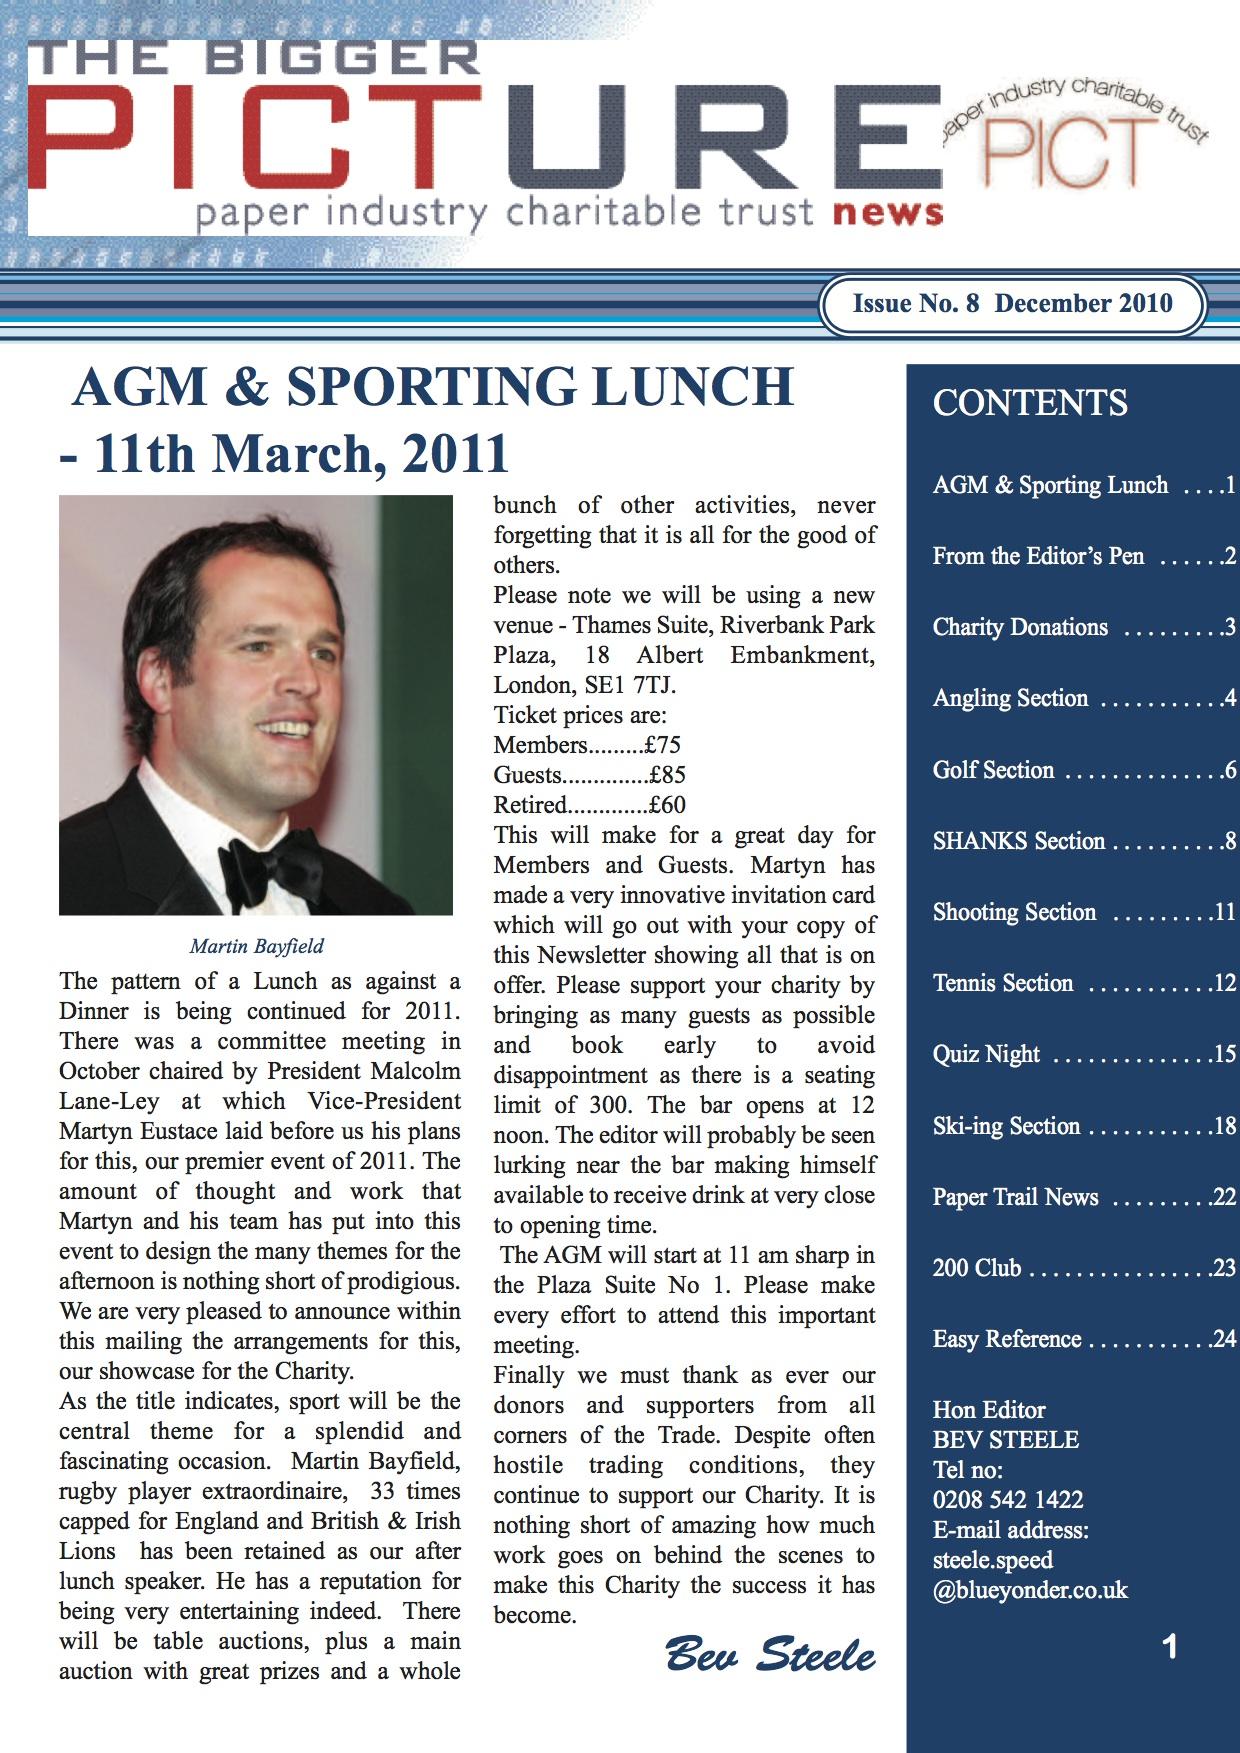 Issue 8 - December 2010